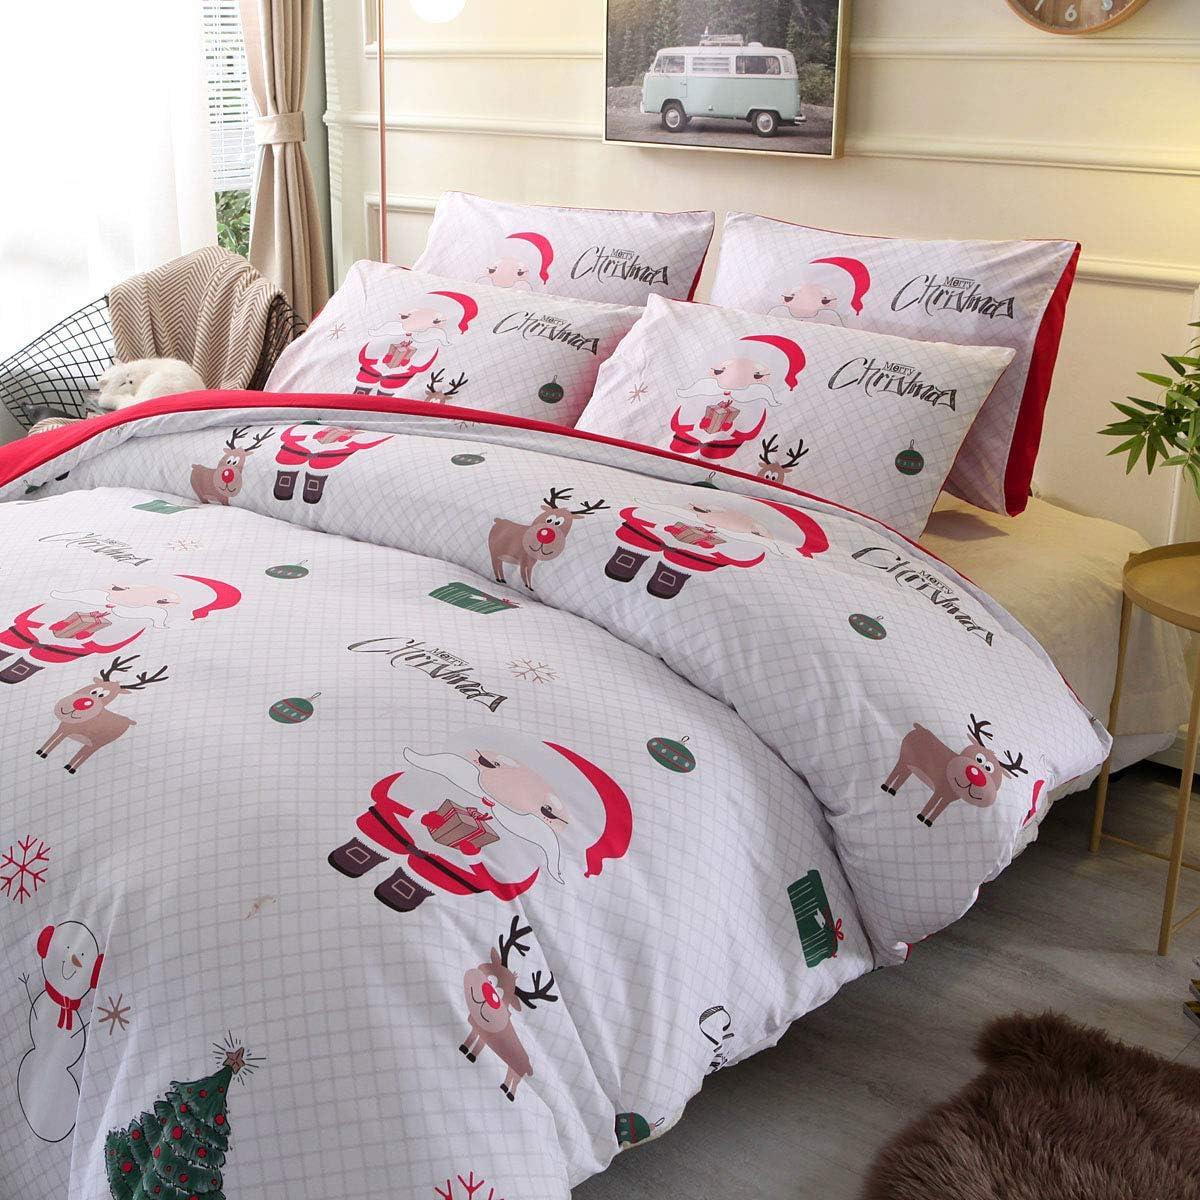 WINLIFE 2PCS Soft Microfiber Duvet Cover Set for Kids Santa Claus Print Bedding Twin White